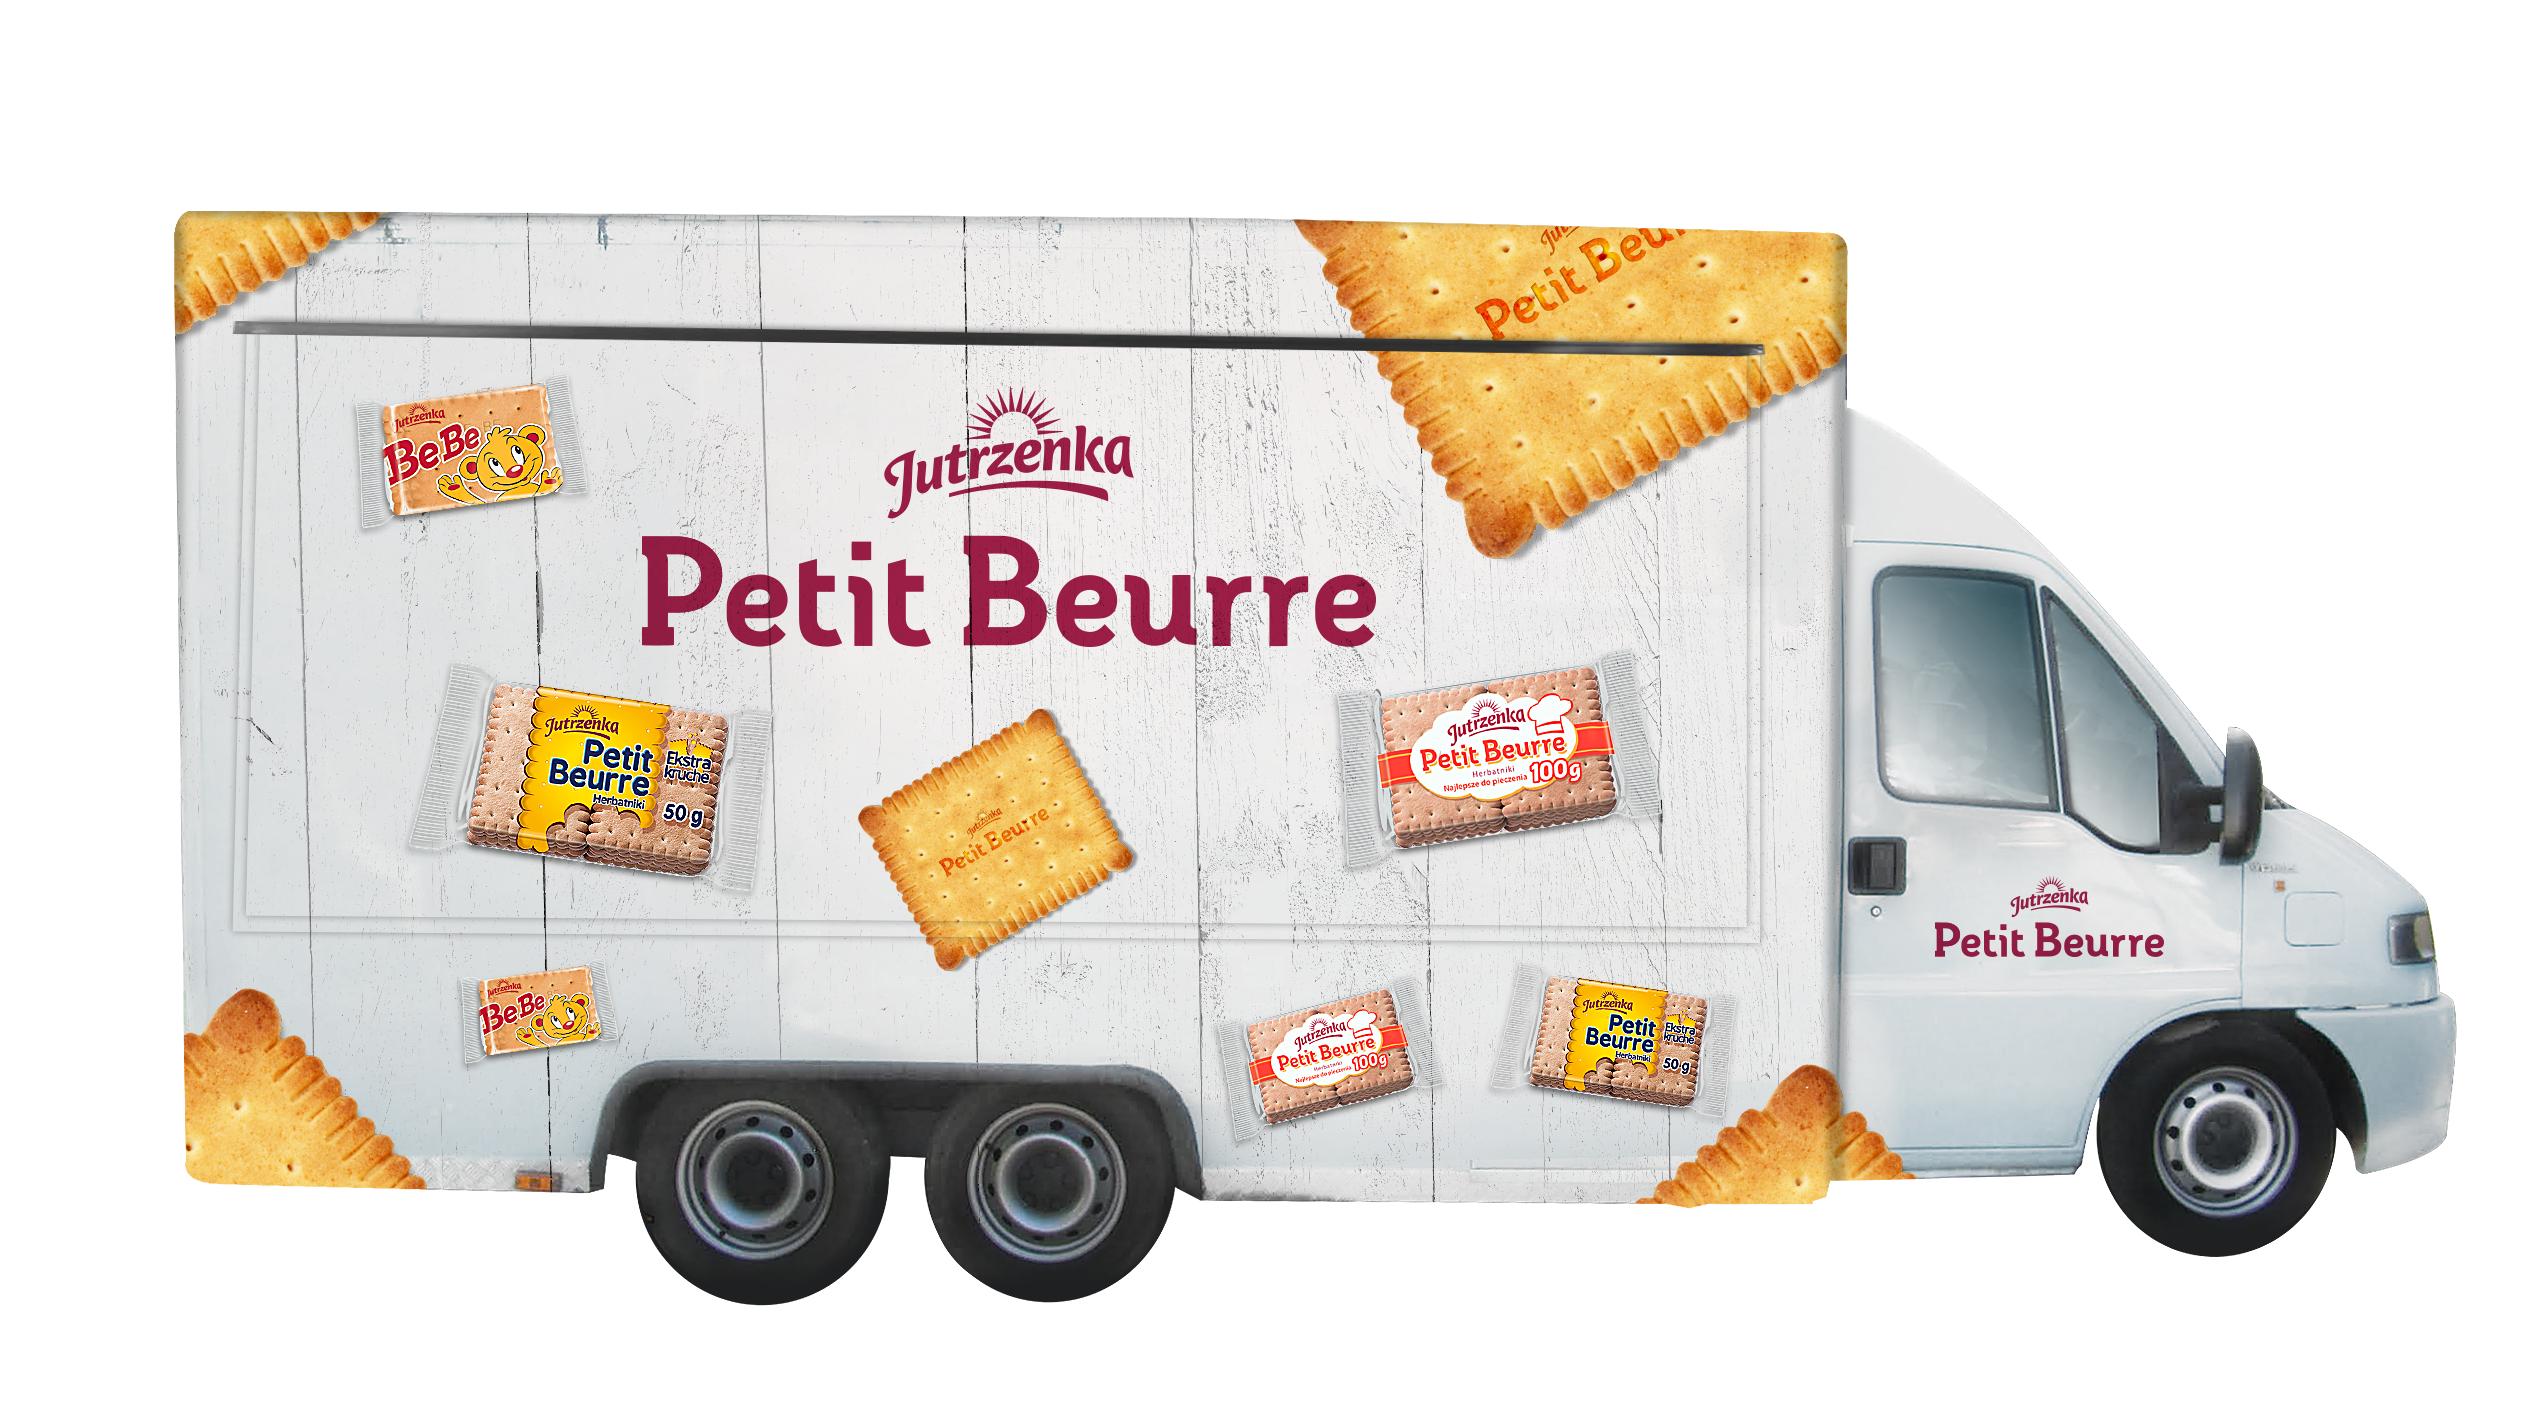 Food truck Petit Beurre Jutrzenka z tournée po Polsce